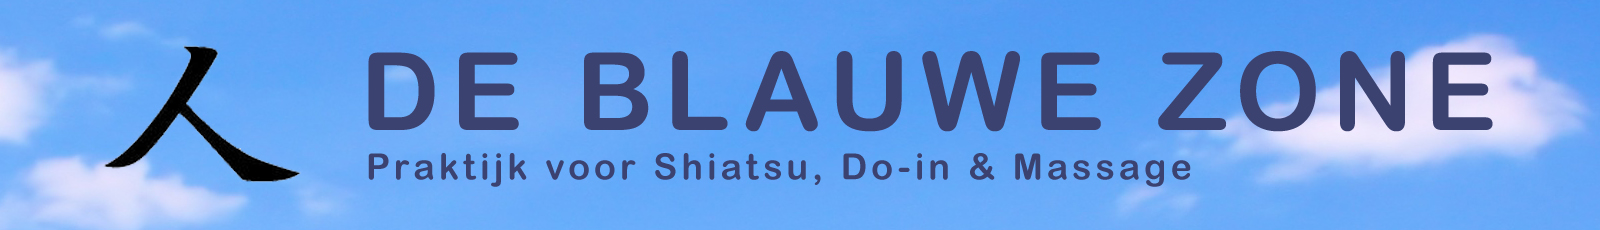 Banner van Shiatsu de Blauwe Zone